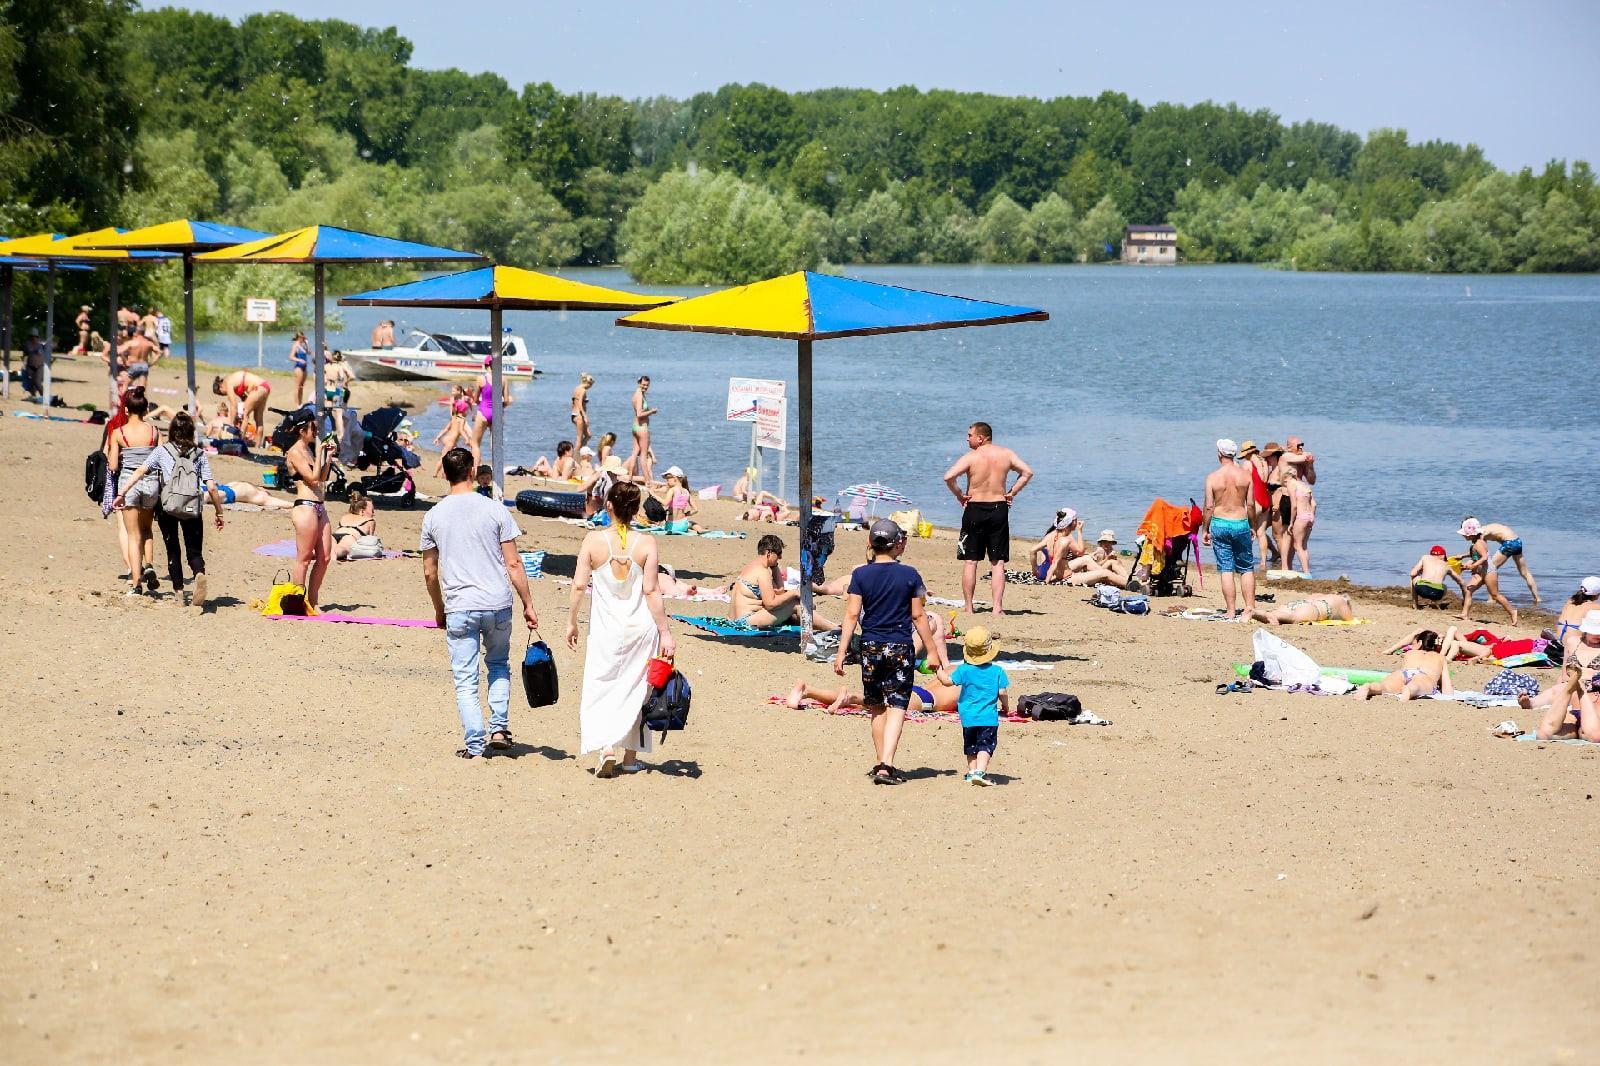 фото Бикини, селфи и горячий песок: 10 жарких фото с Бугринского пляжа в Новосибирске 3